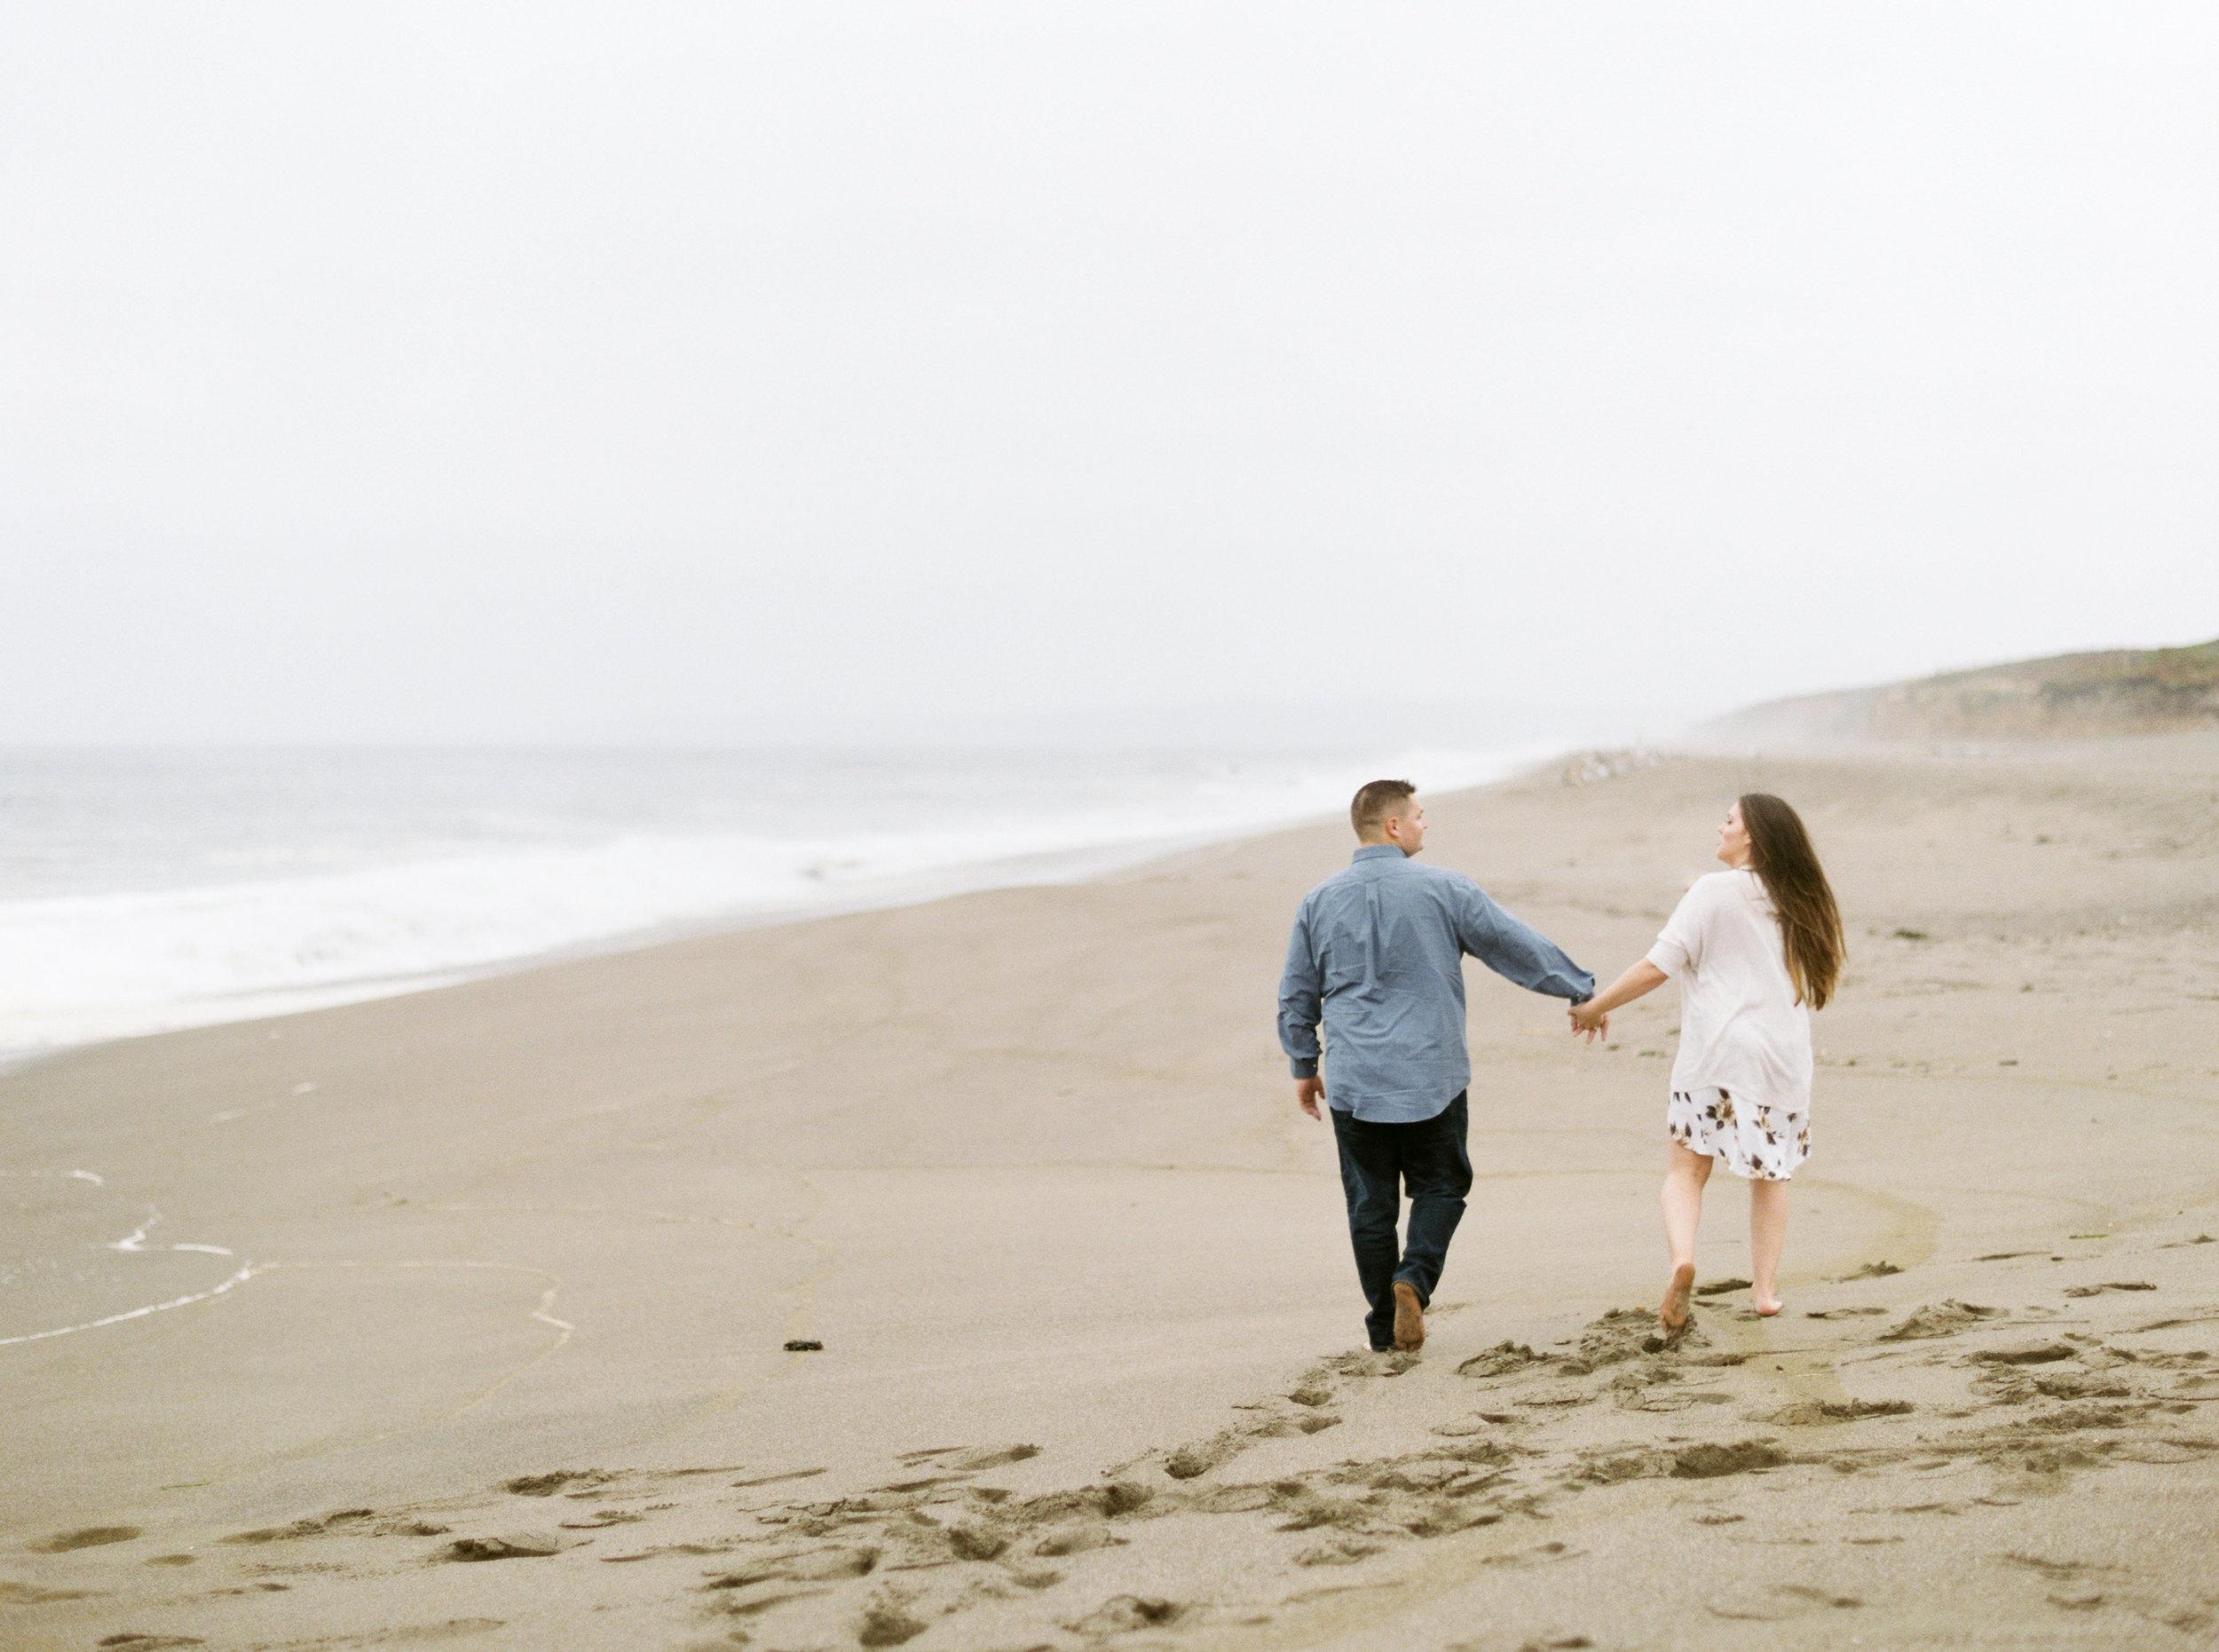 Point-reyes-california-engagement-photographer-35.jpg